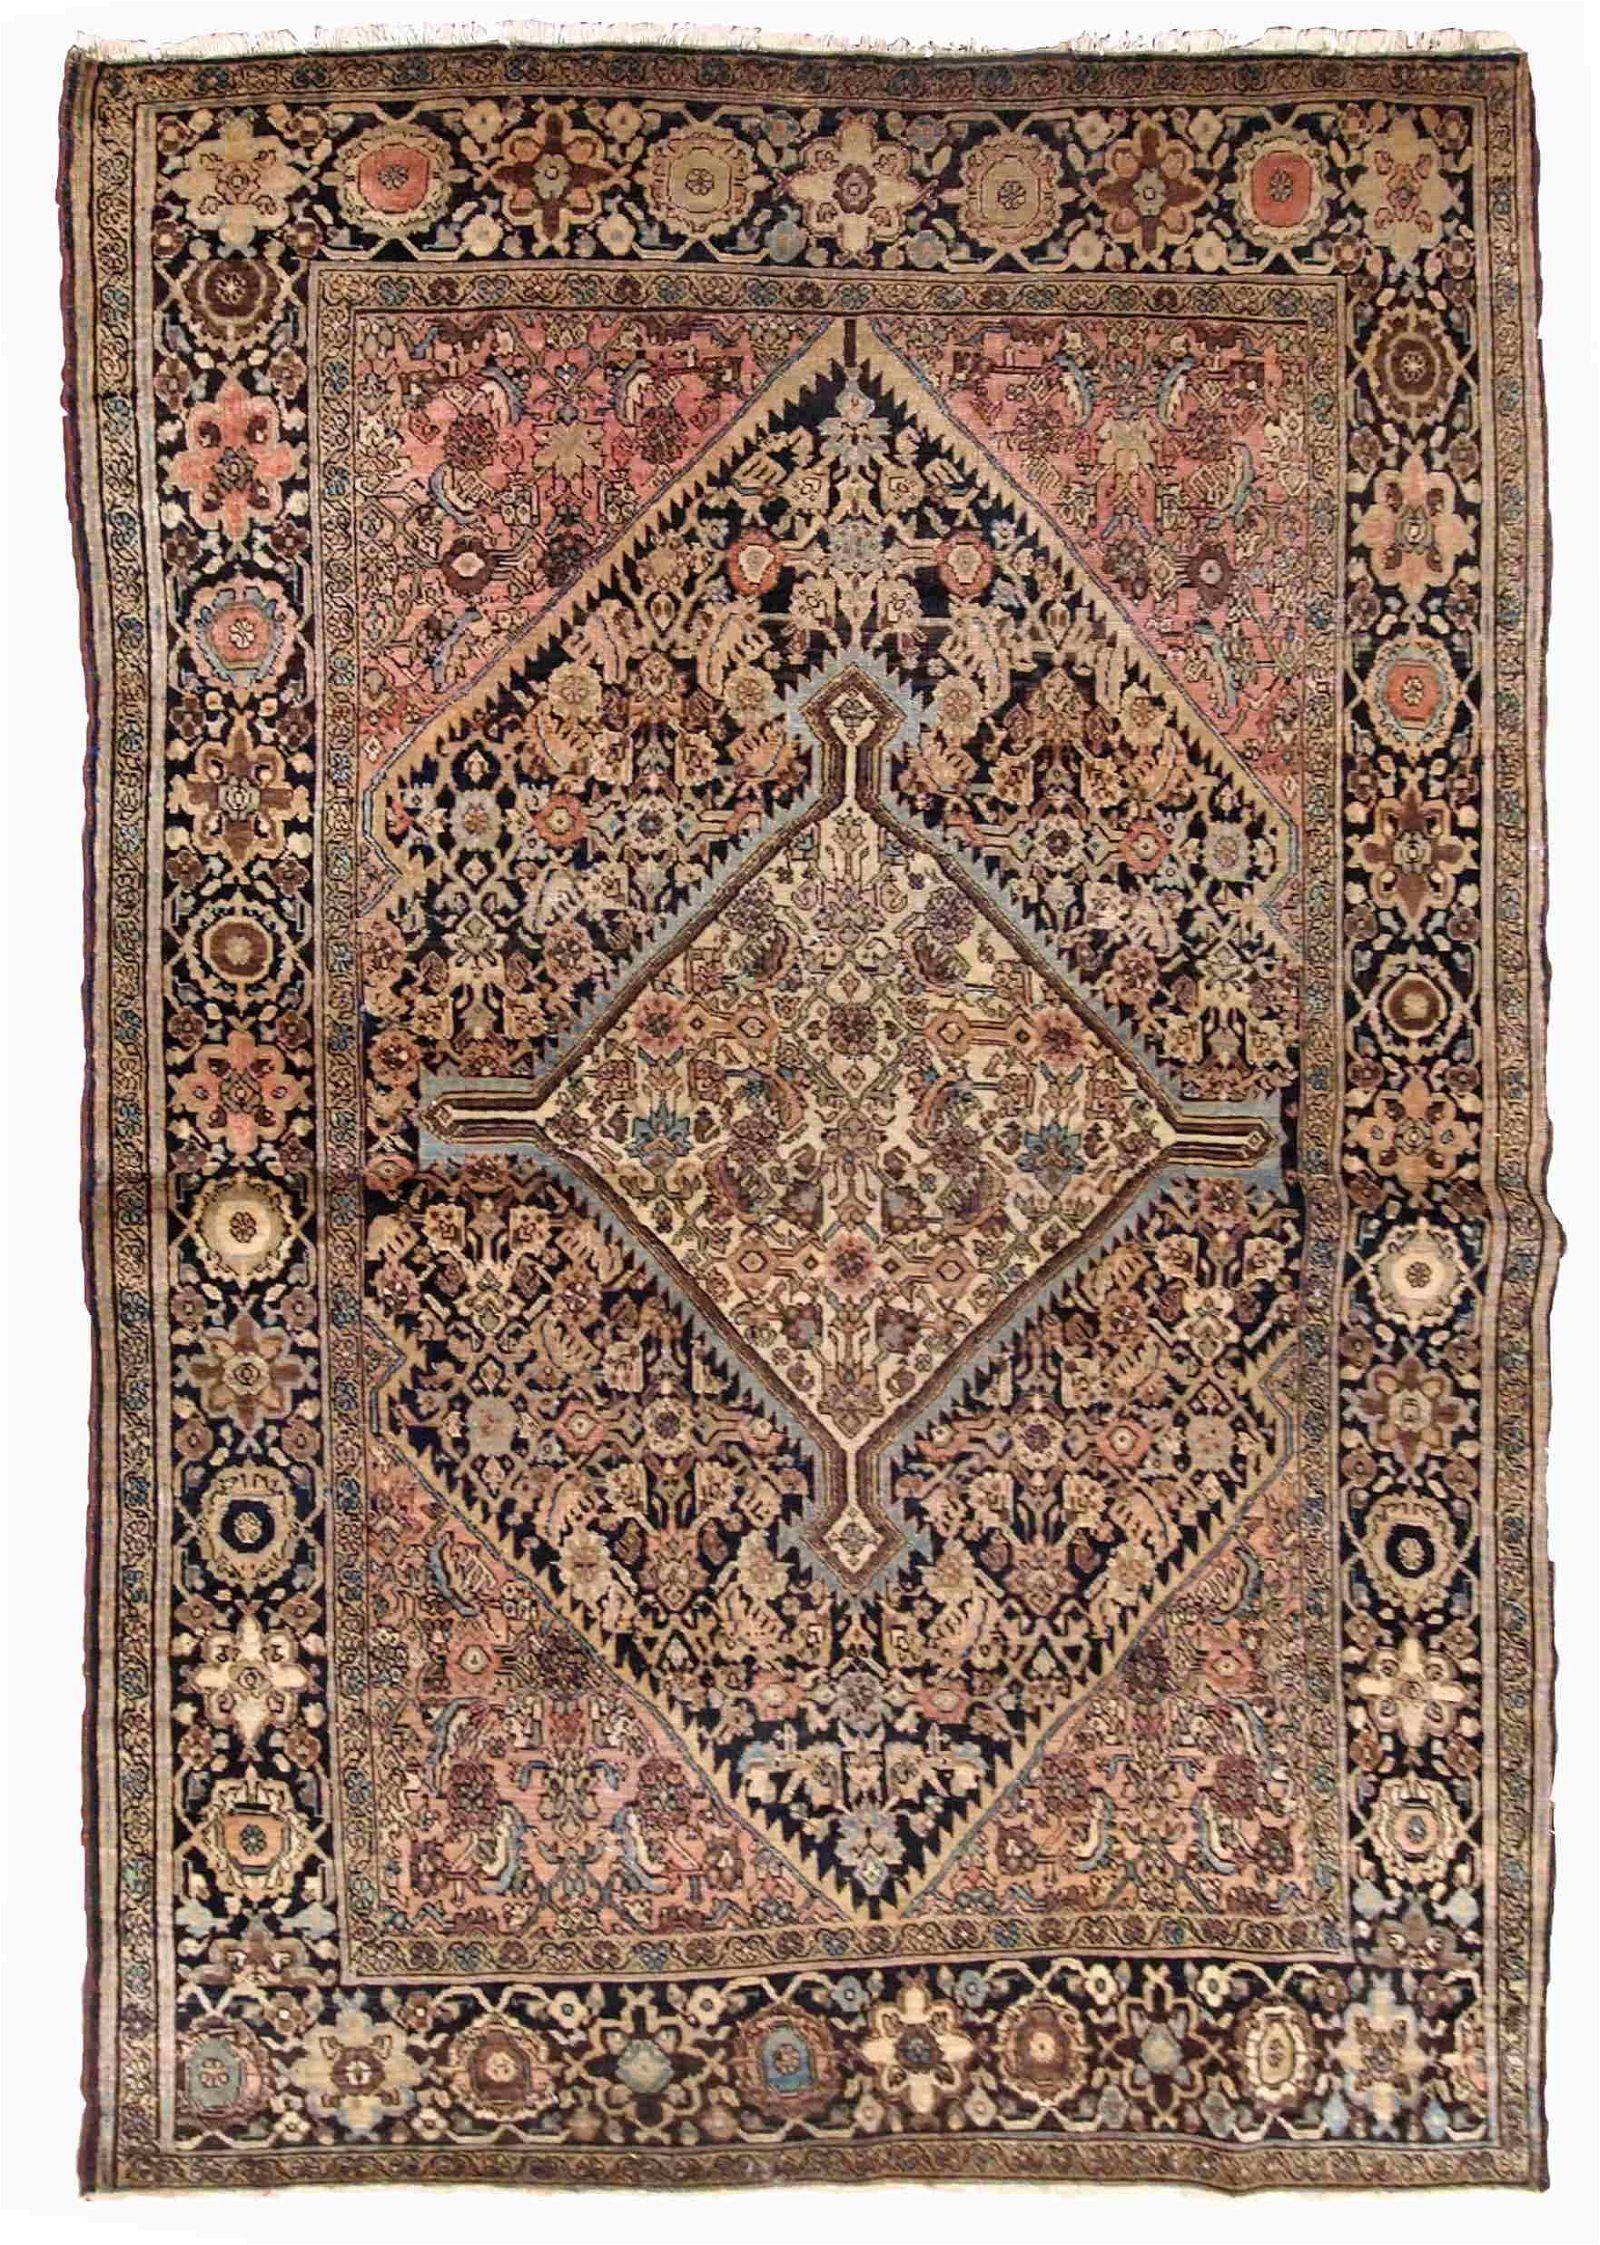 Handmade antique Persian Sarouk Farahan rug 3.4